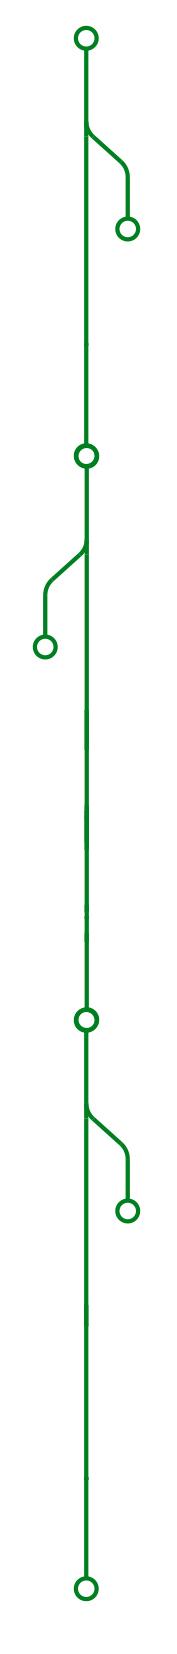 Grant Search Keywords Grant Writing UK Grant Consultant UK Grant Writer UK Grant Consultant Company Grant Consulting Company Grant Consulting Servicies Grant Application Consulting Servicies Grant application consultancy services Grant application consultants Grant funding consultants Funding consultants uk Professional grant writers uk  www.alp-technologies.com http://www.alp-technologies.com/new-index#new-page-68